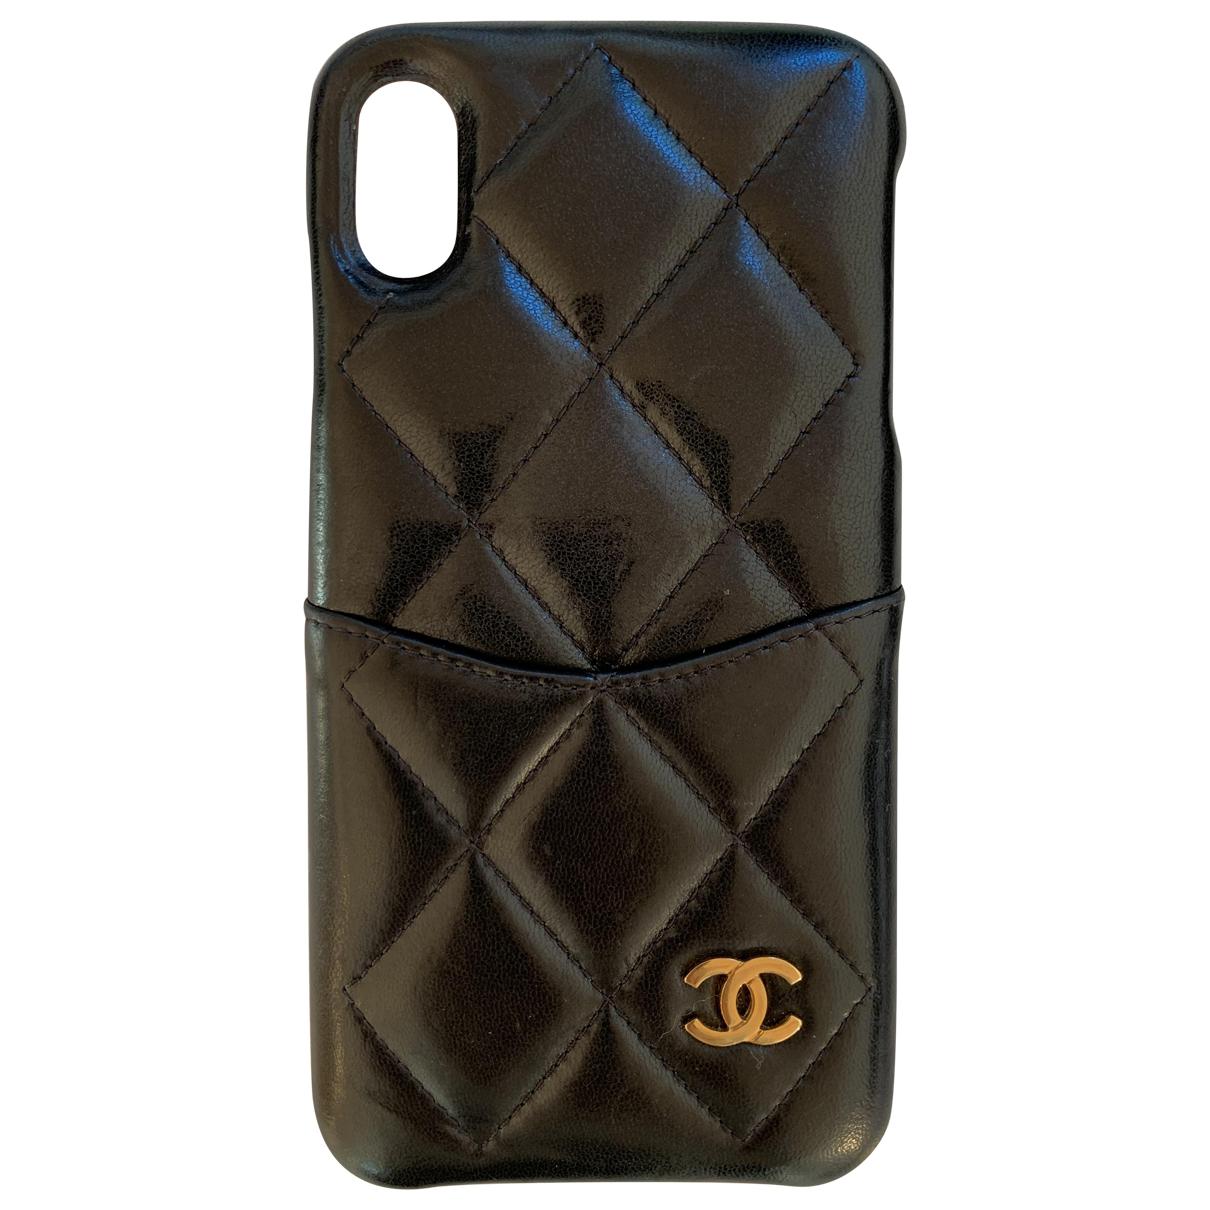 Marroquineria Timeless/Classique de Cuero Chanel